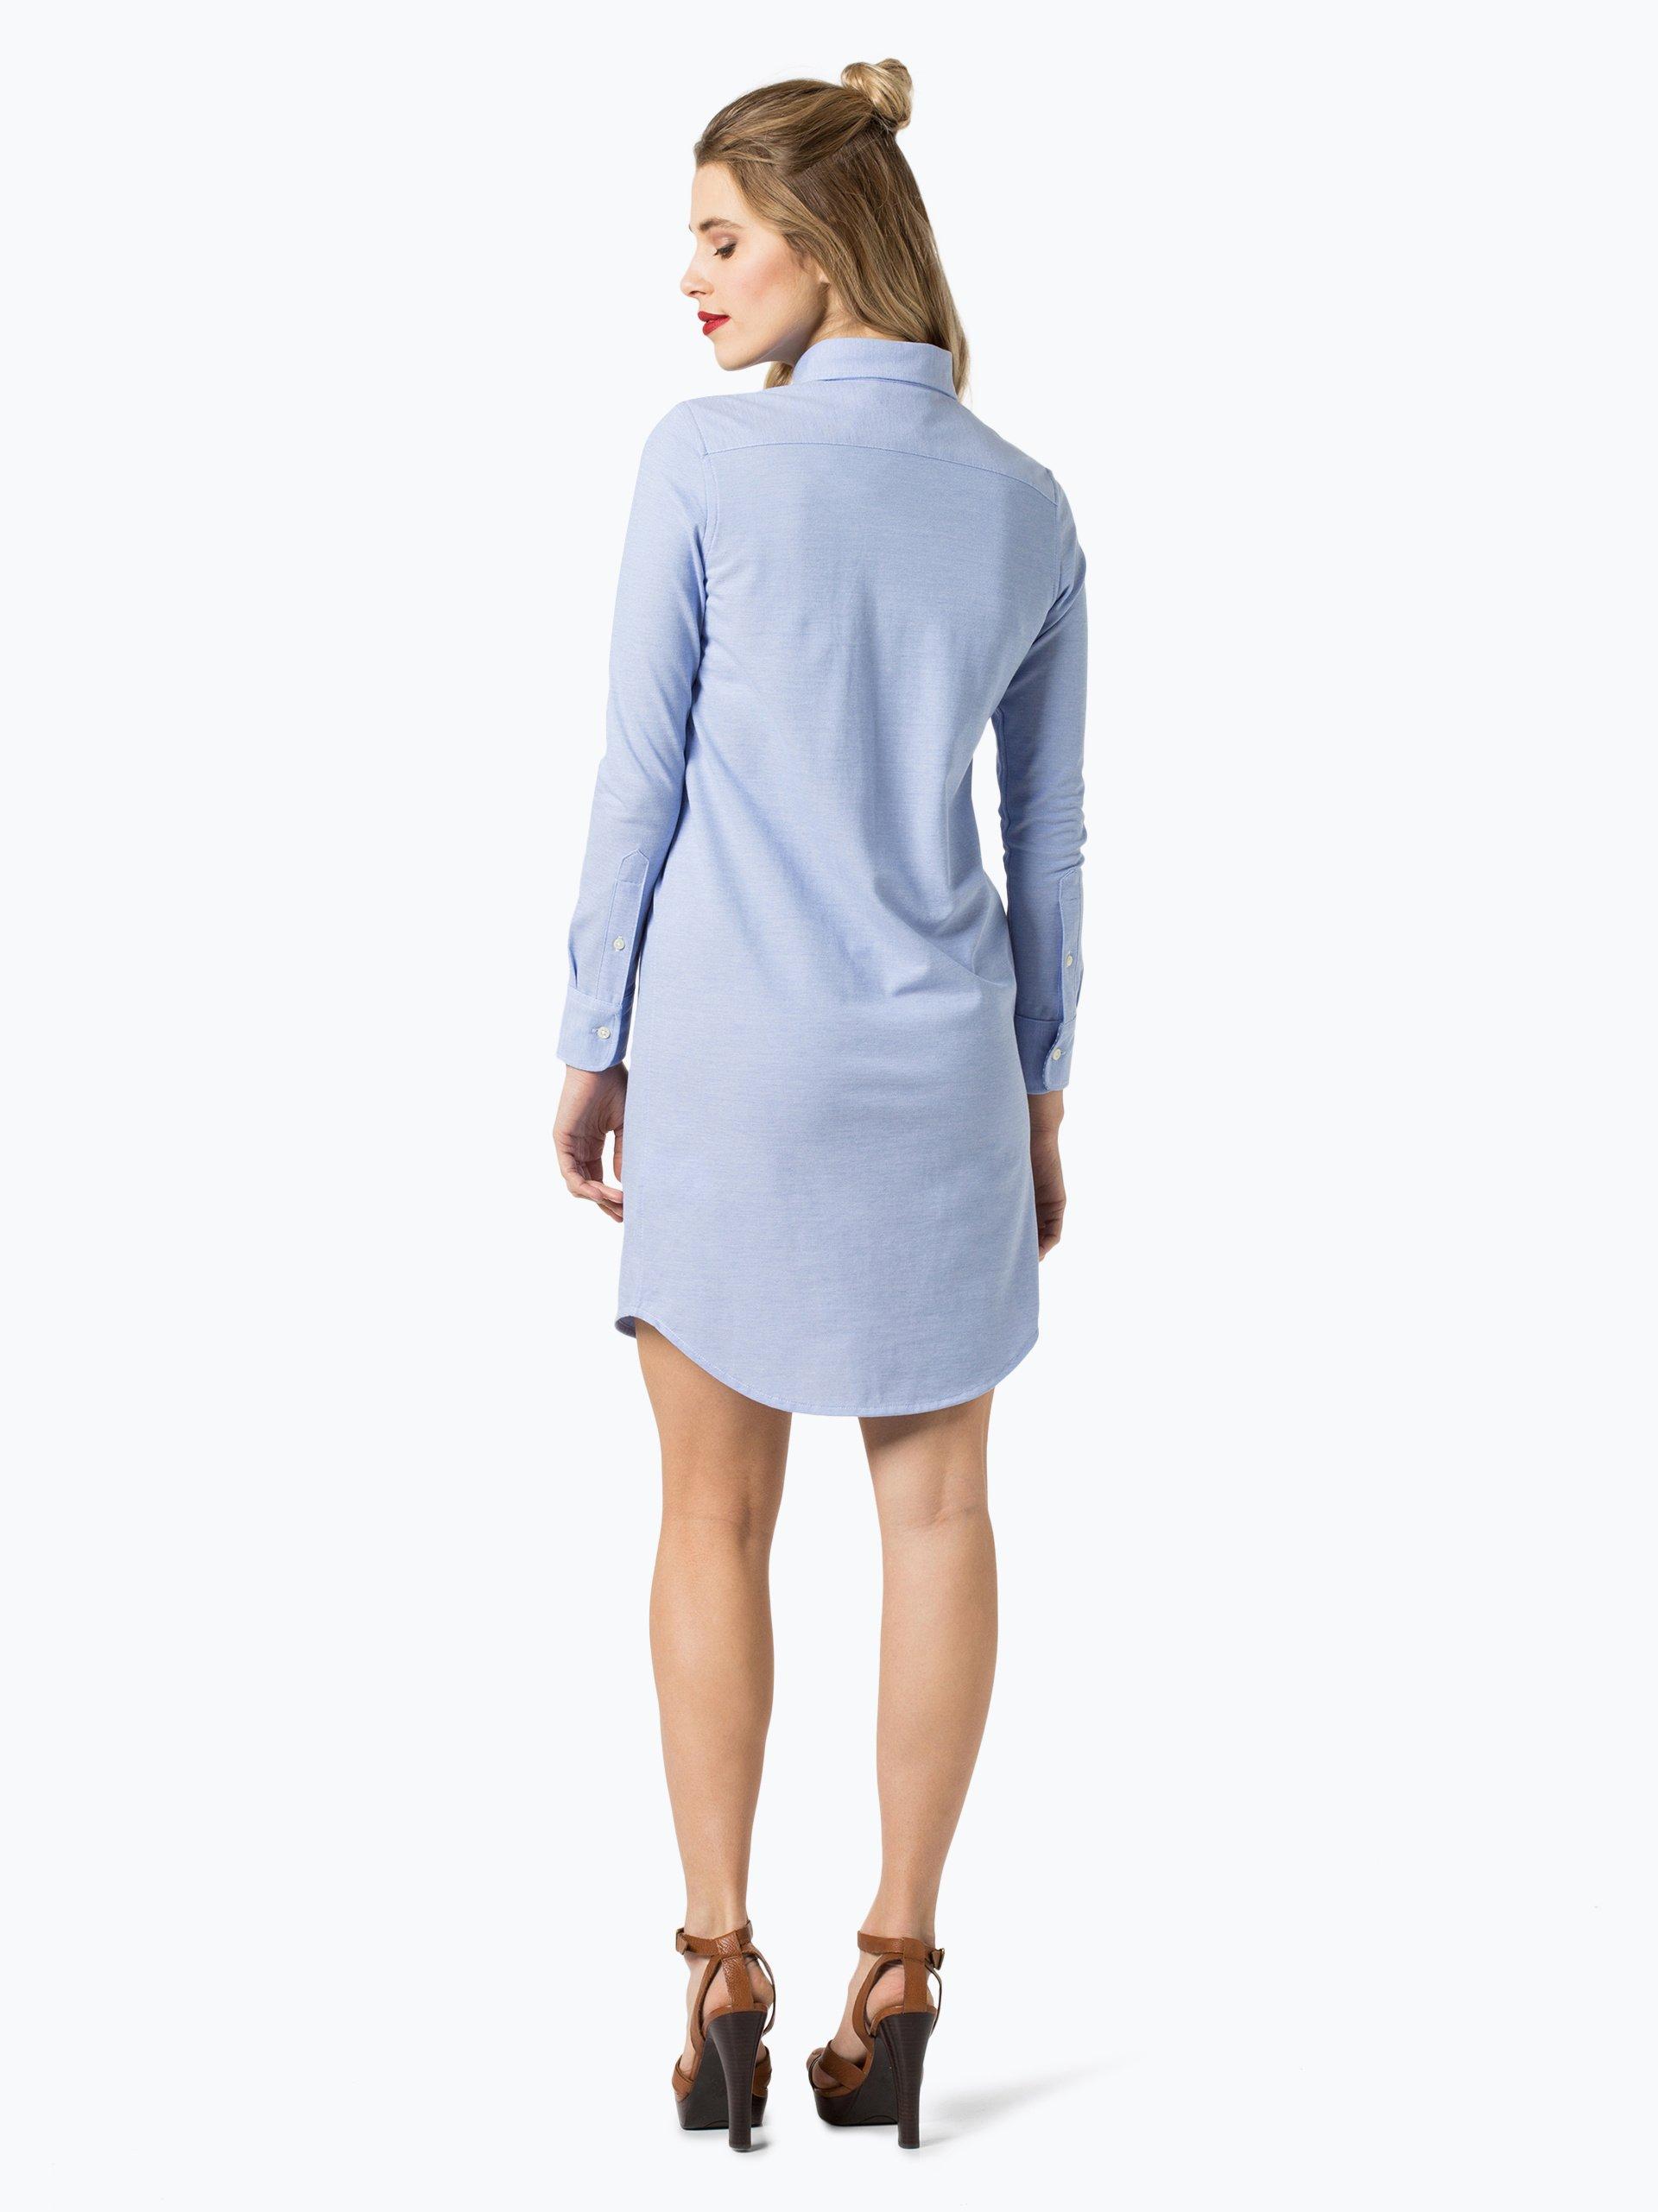 polo ralph lauren damen kleid blau uni online kaufen vangraaf com. Black Bedroom Furniture Sets. Home Design Ideas